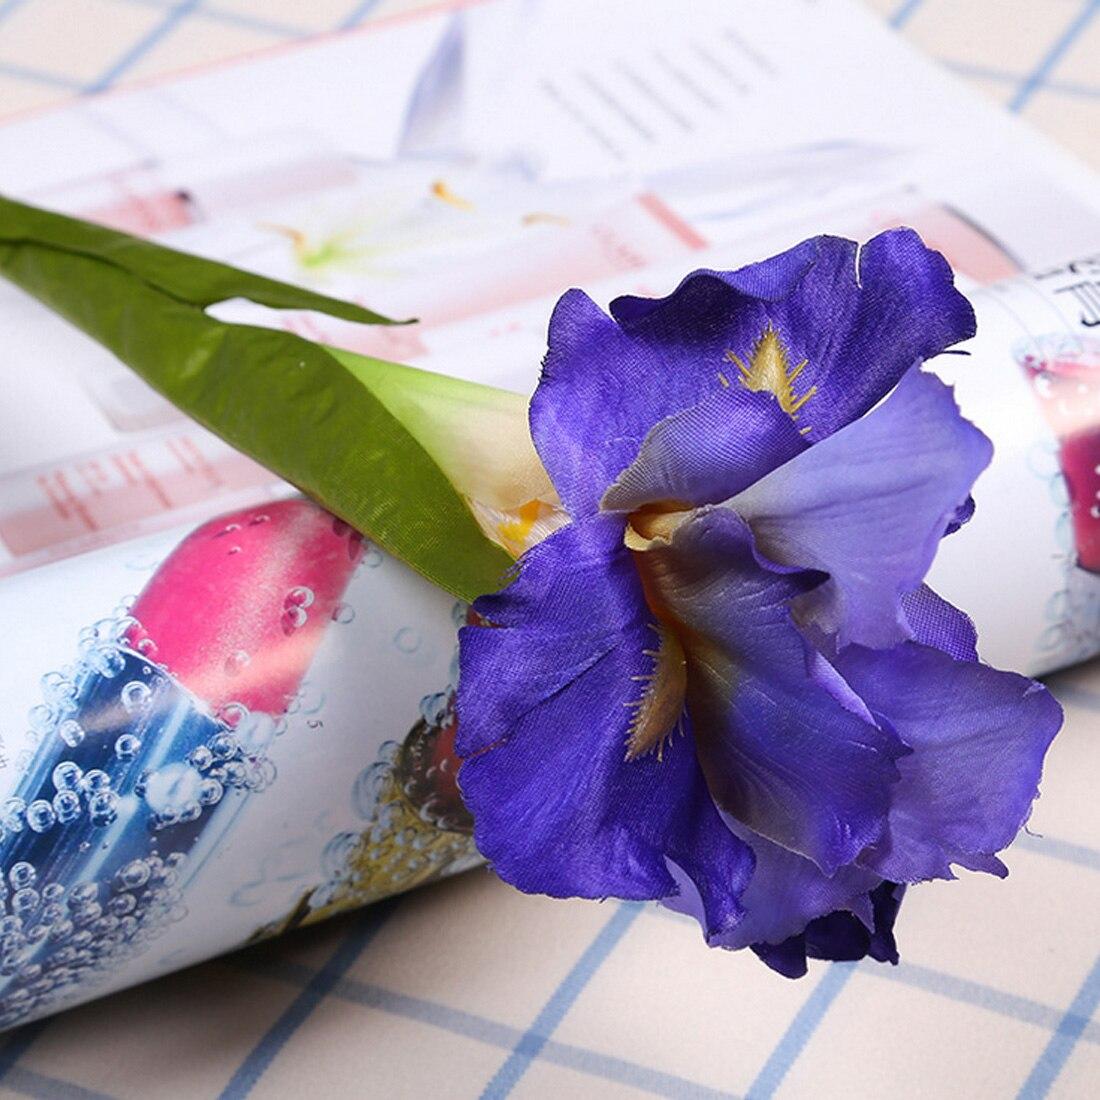 1PCS 66cm Artificial Flower Fake Irish Iris Flower Branch For Spring Wedding DIY Wreath Mini Head Flower For Wedding Home Decor